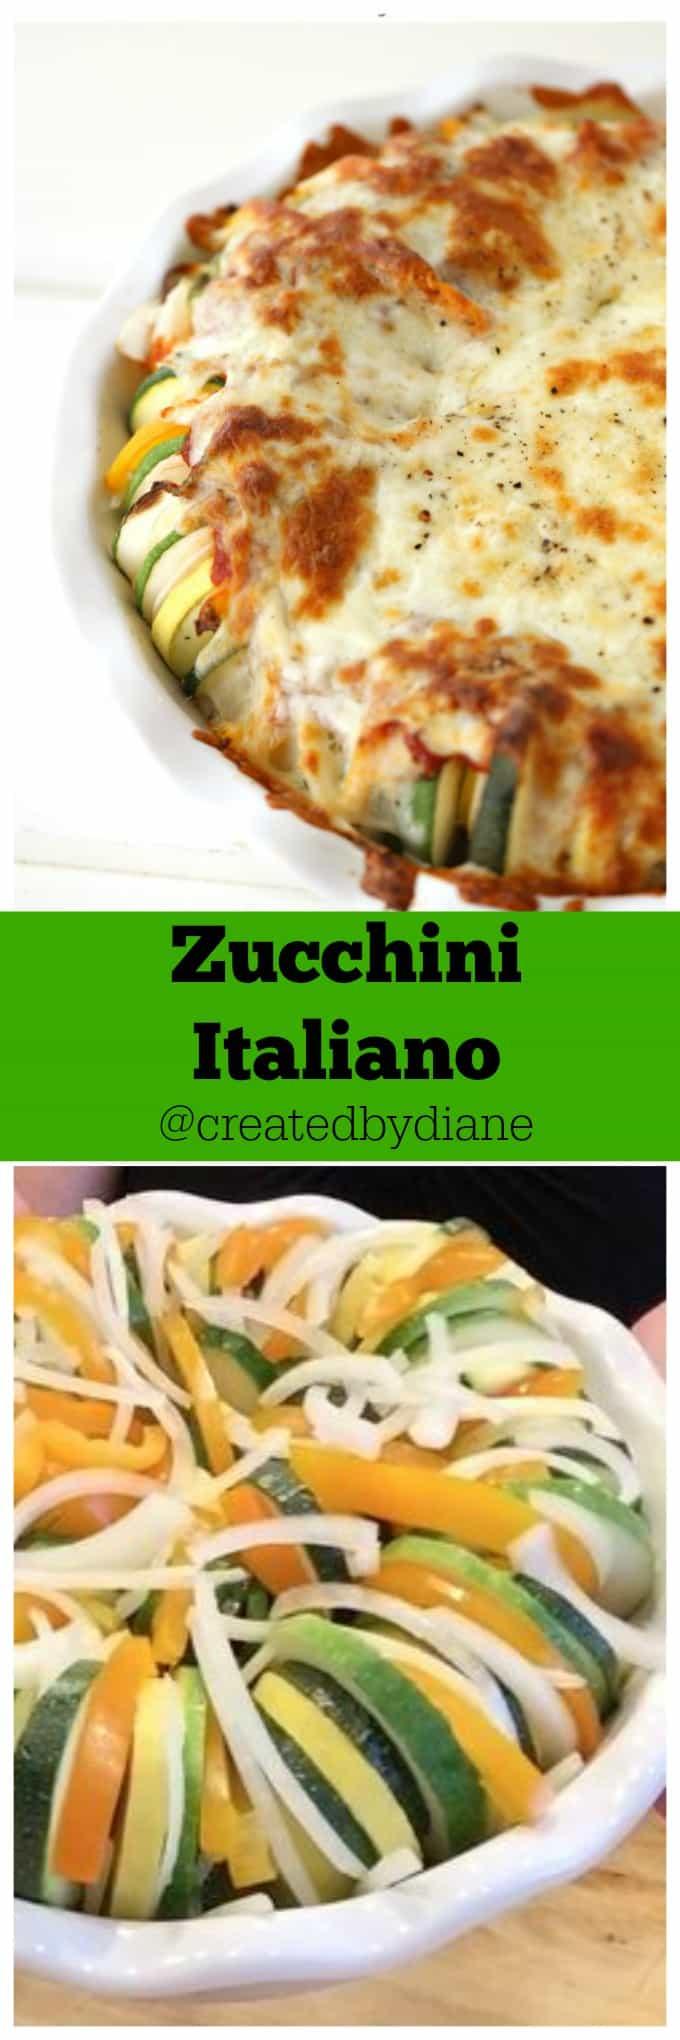 Zucchini Italiano @createdbydiane